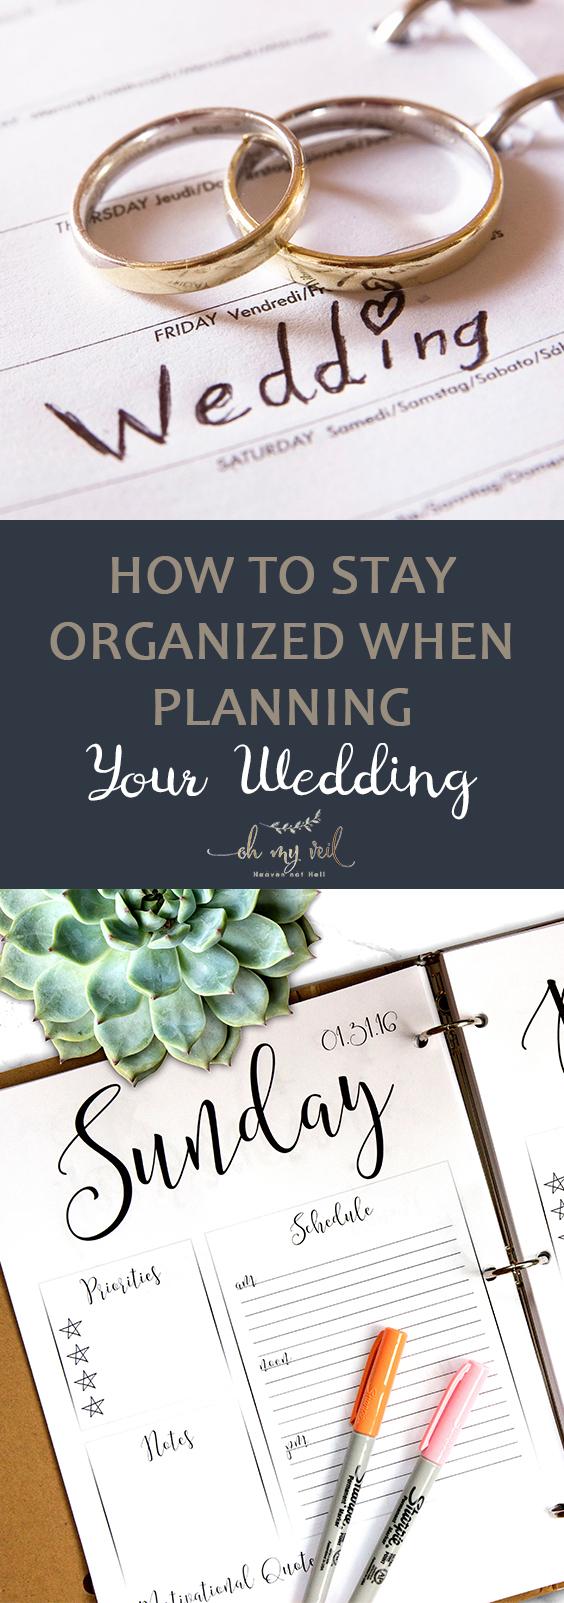 Stay Organized, Wedding Planning, Wedding Planning Tips, Wedding Planning Hacks, How to Plan Your Wedding, Stress Free Wedding Planning, Stress Free Wedding